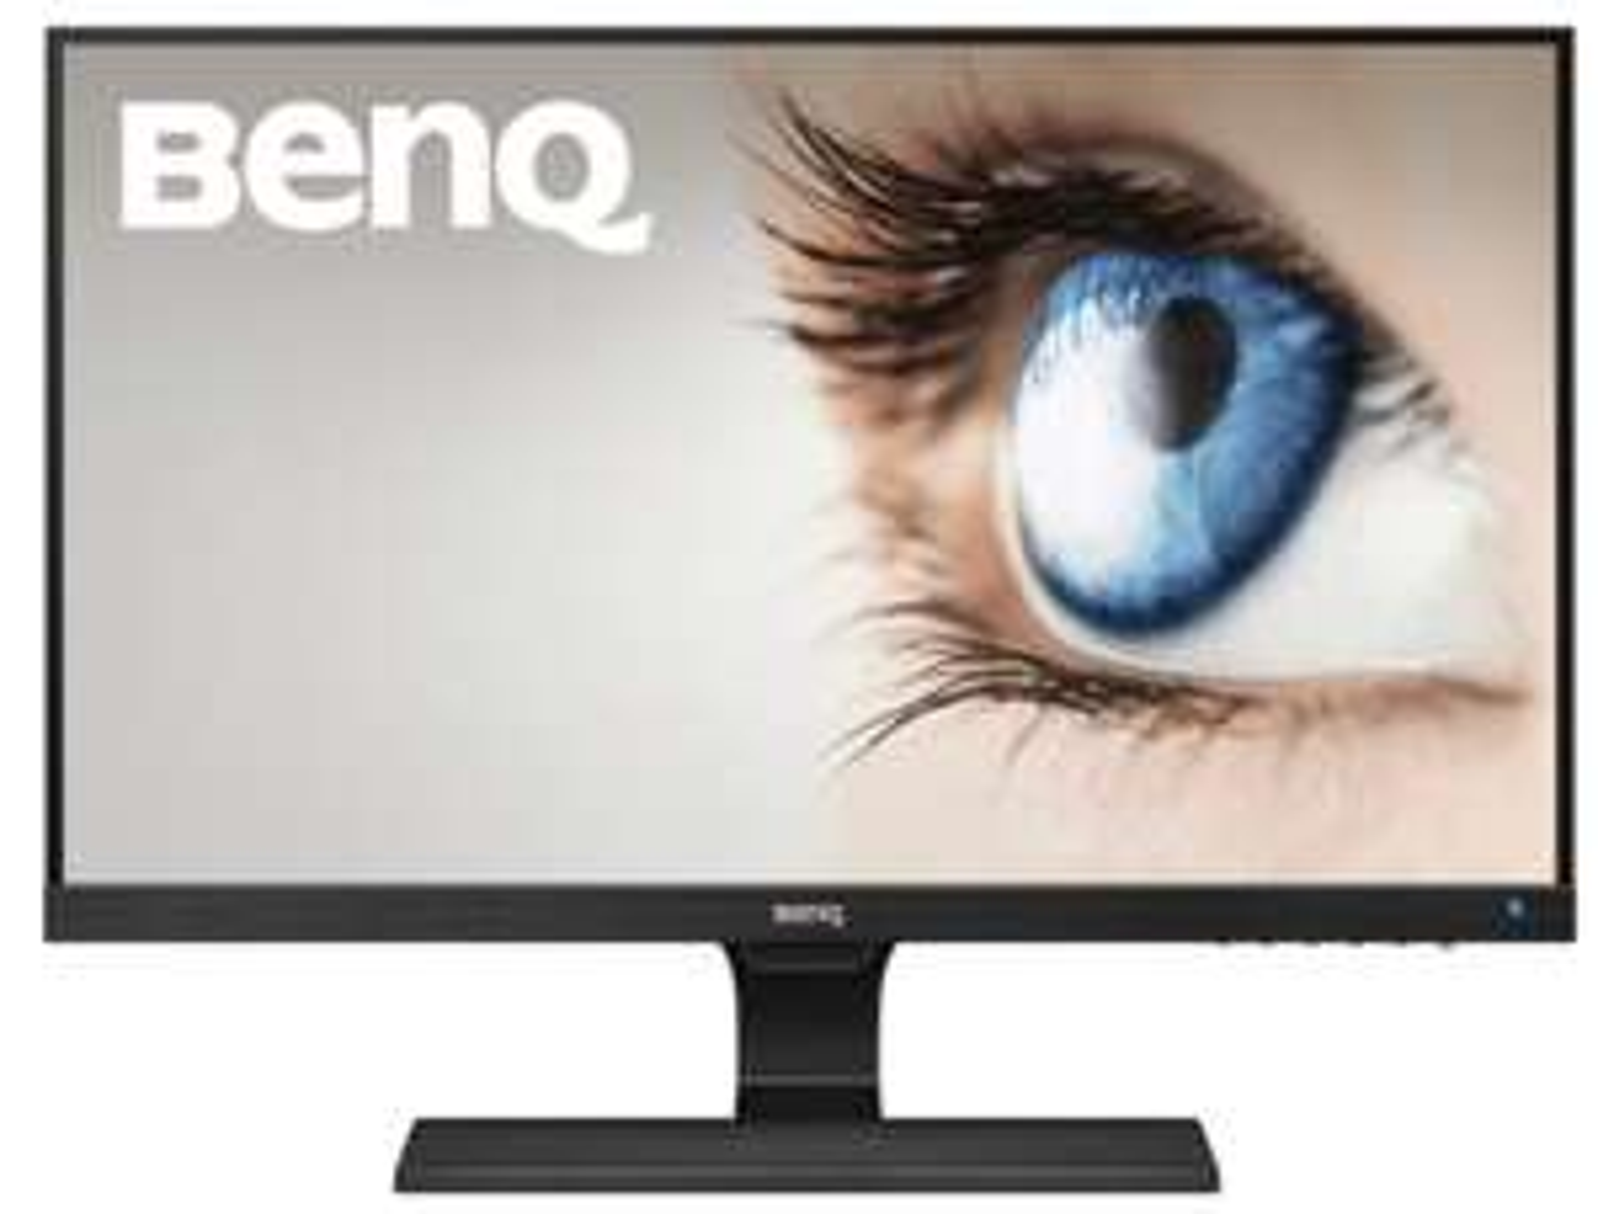 [Alternate] BENQ EW2775ZH 27 Zoll Full-HD Monitor 2x HDMI 1x D-Sub Kanäle 4 ms für 122,88€ bei Bezahlung mit MasterPass